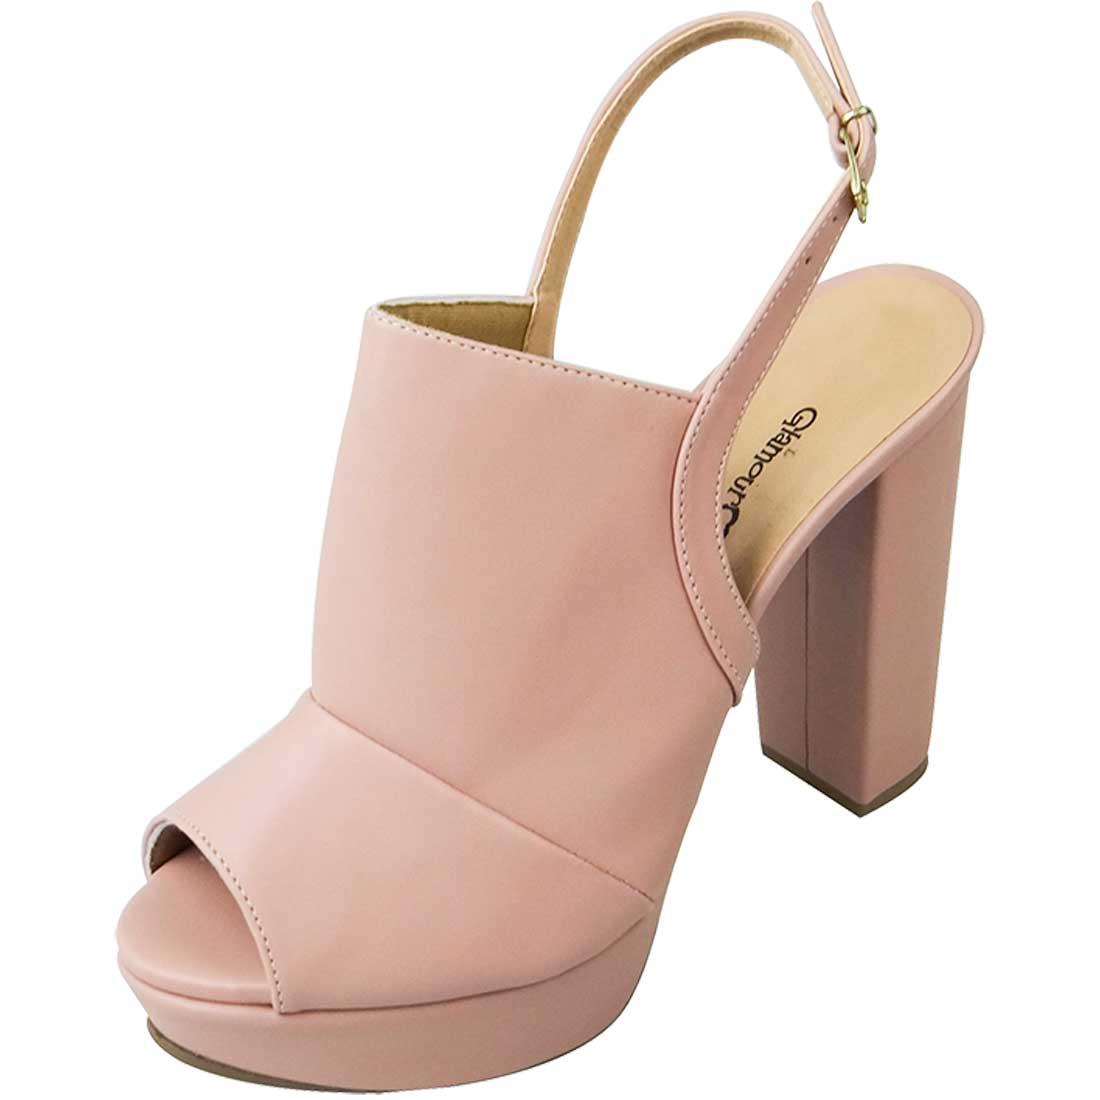 Sandal Boot Meia Pata - Rosa Bebê